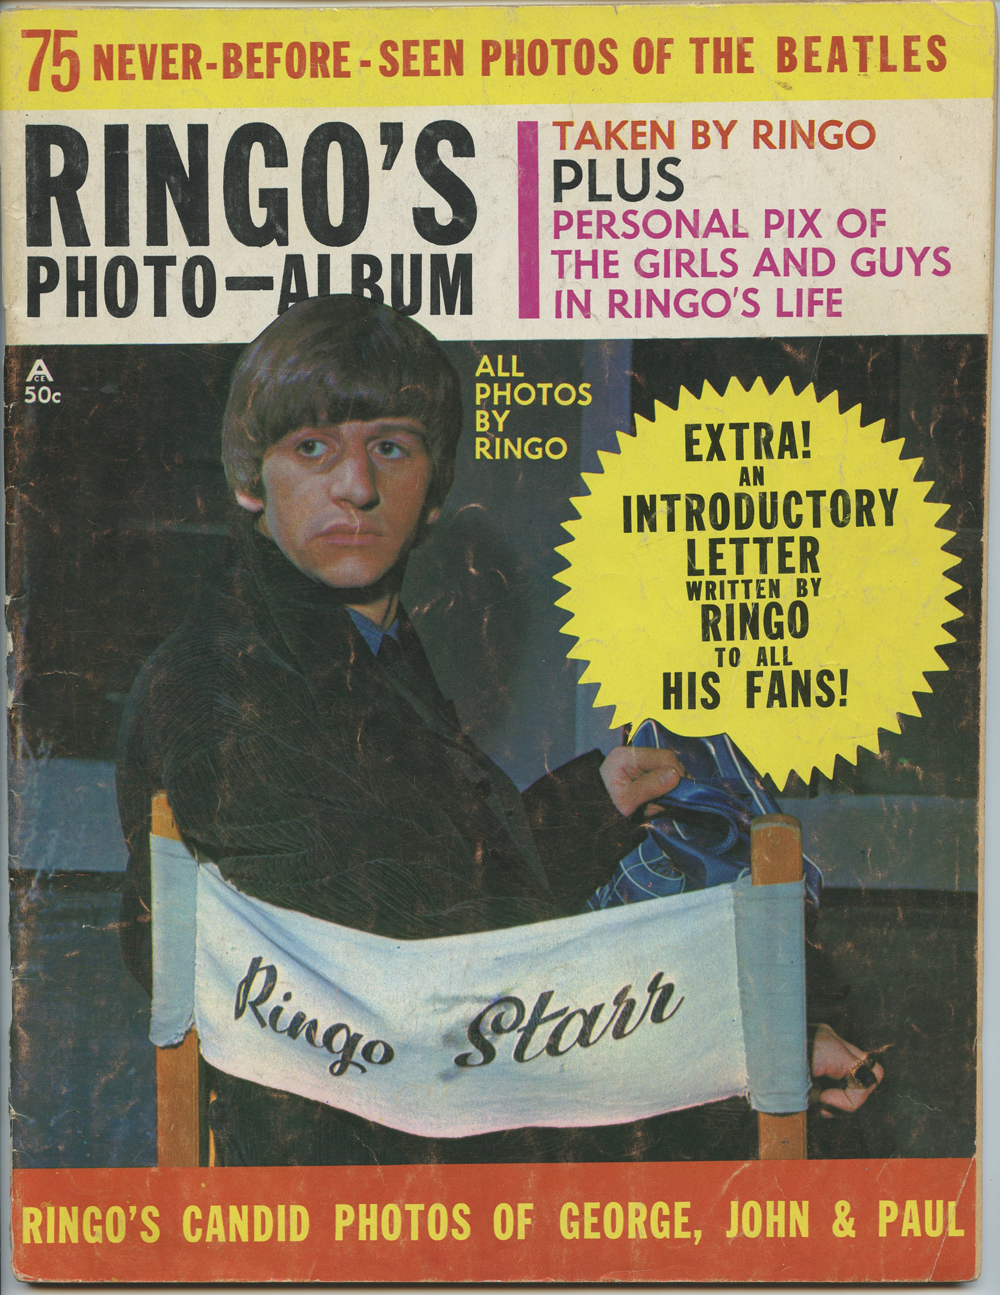 The Beatles Magazine Back Issue Ringo's Photo Album 1964